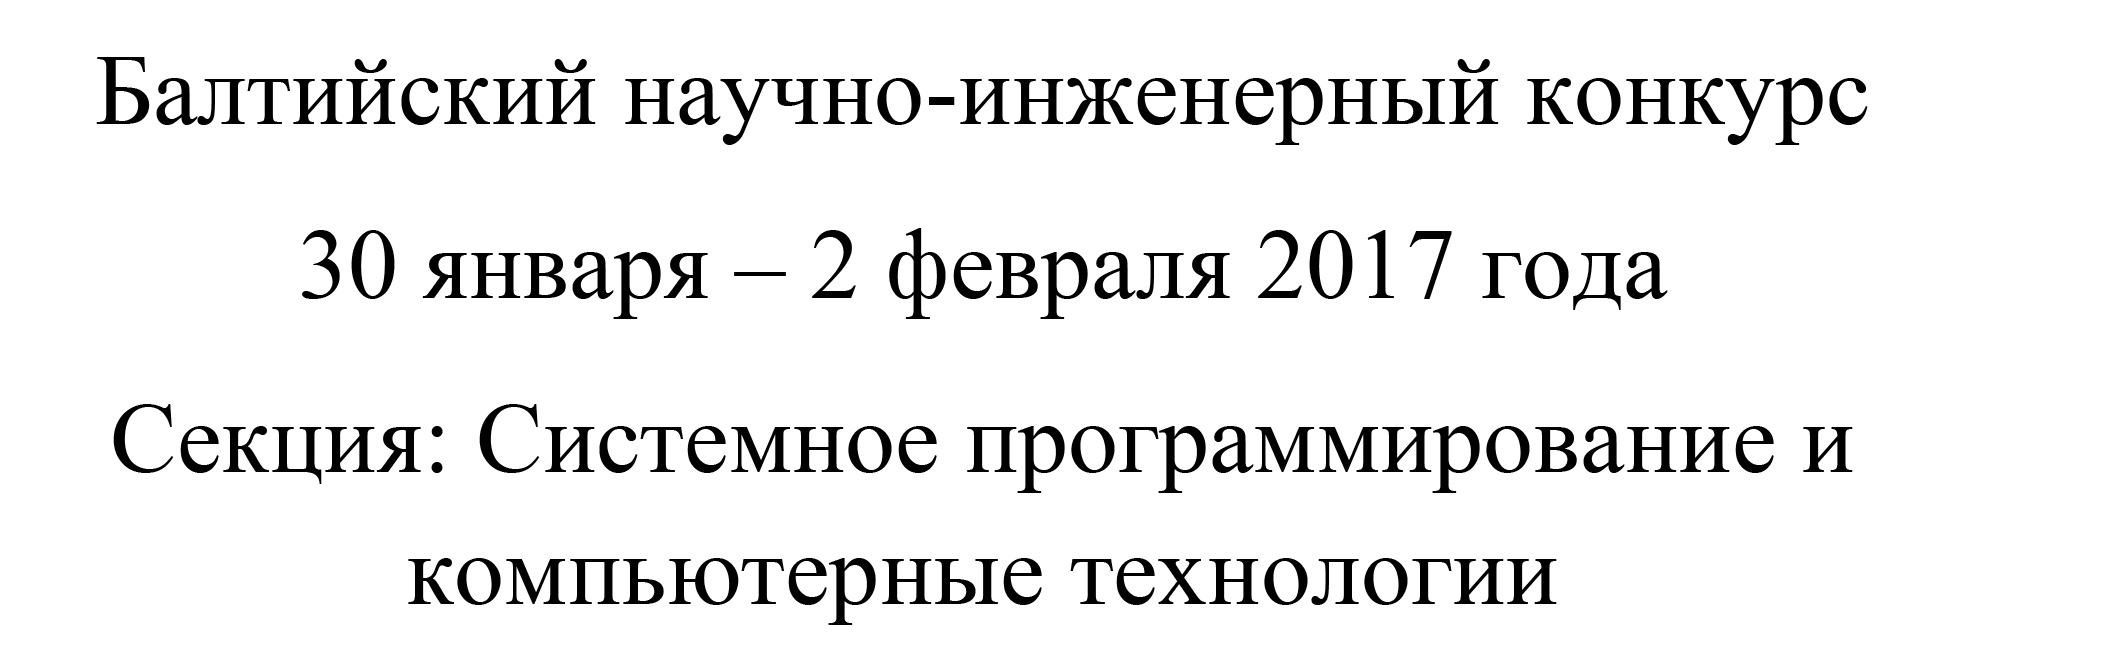 Сборник тезисов-85